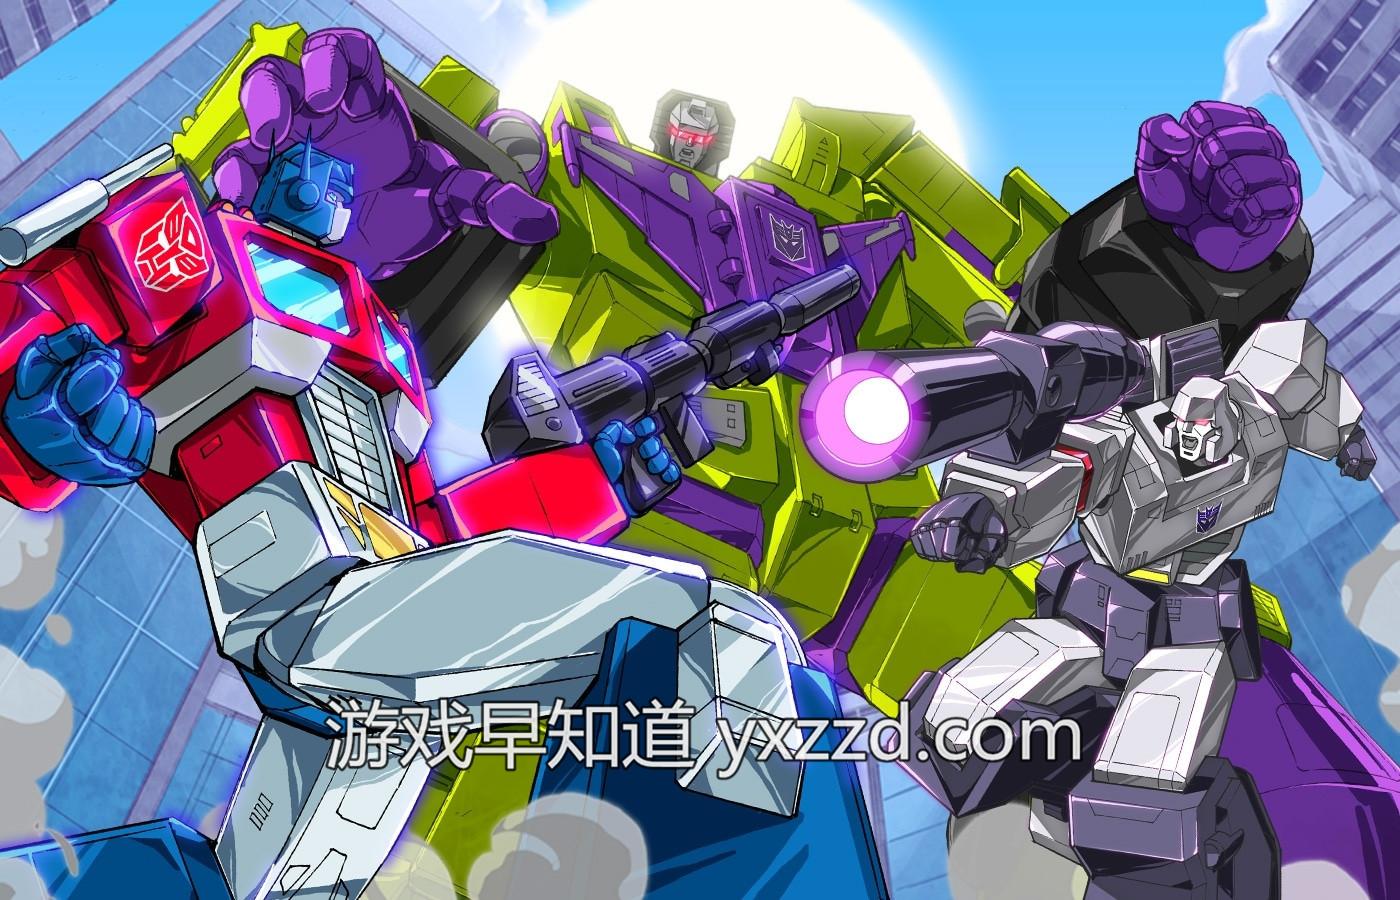 变形金刚毁灭Transformers: Devastation